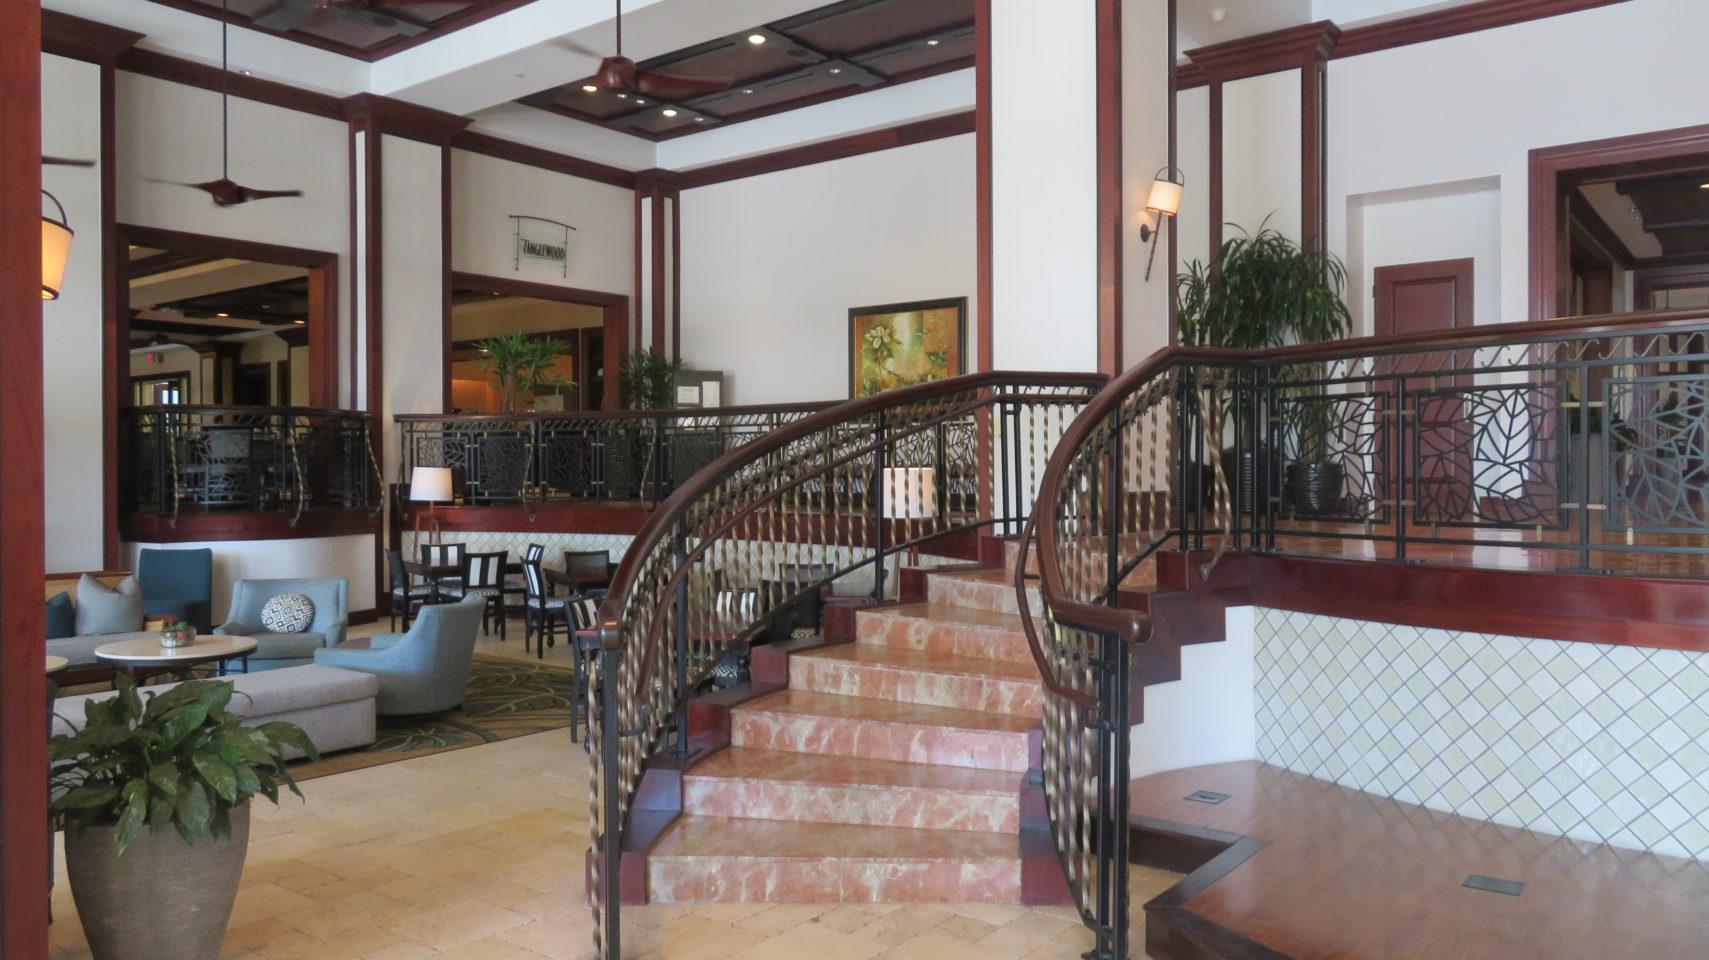 Spacious refined elegance of the Hyatt Regency Coconut Point ~ Gem of a Florida Resort